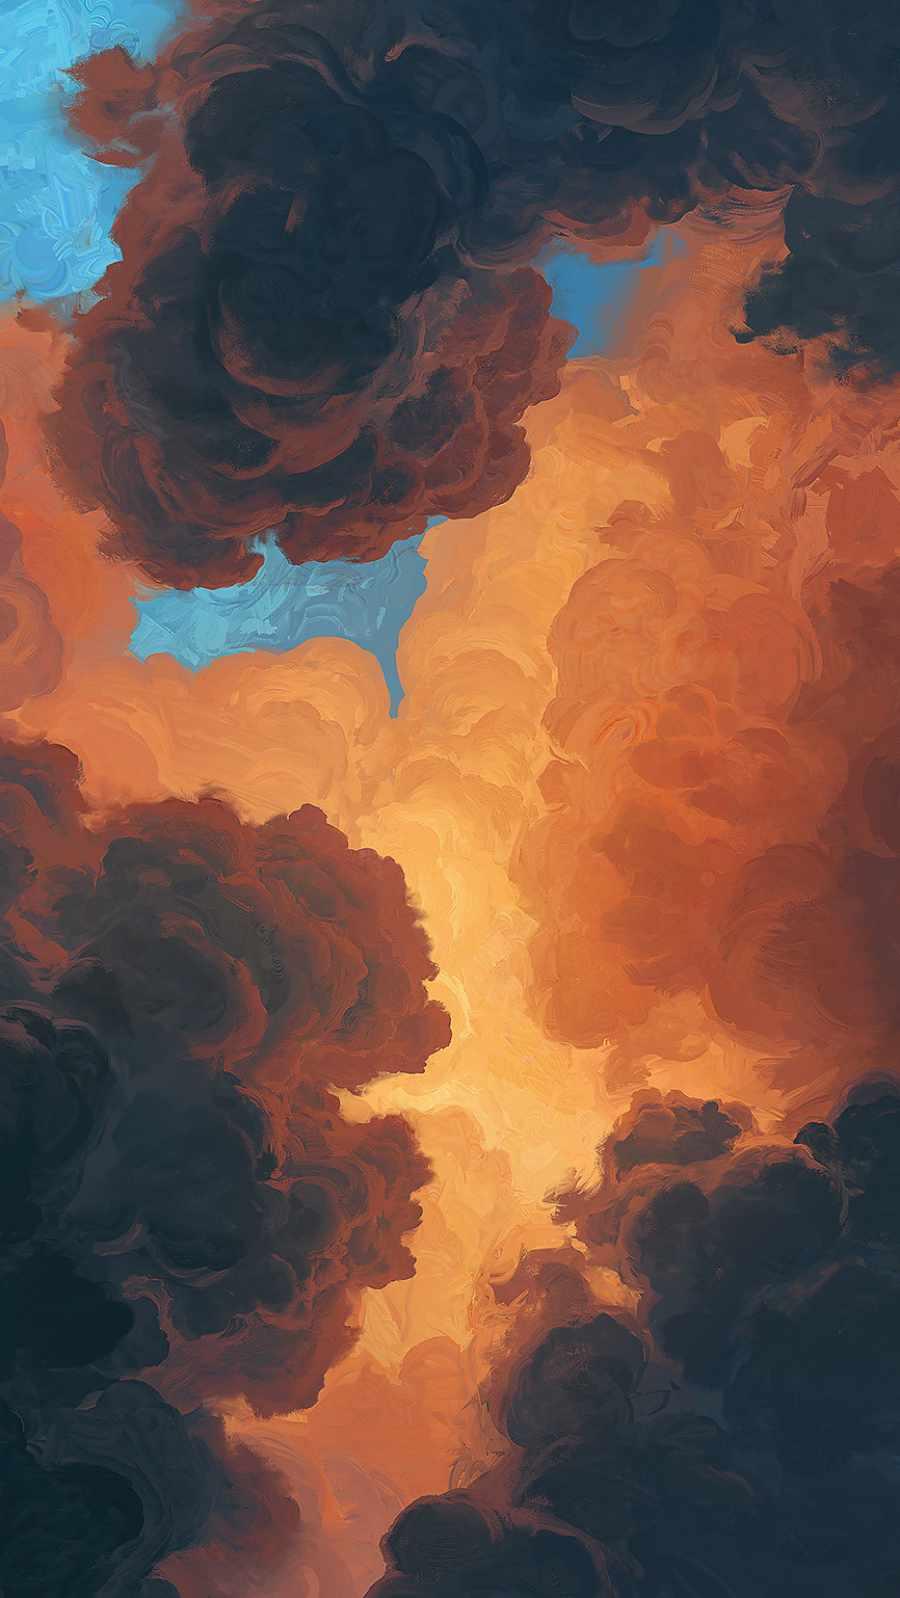 Cloudy iPhone Wallpaper